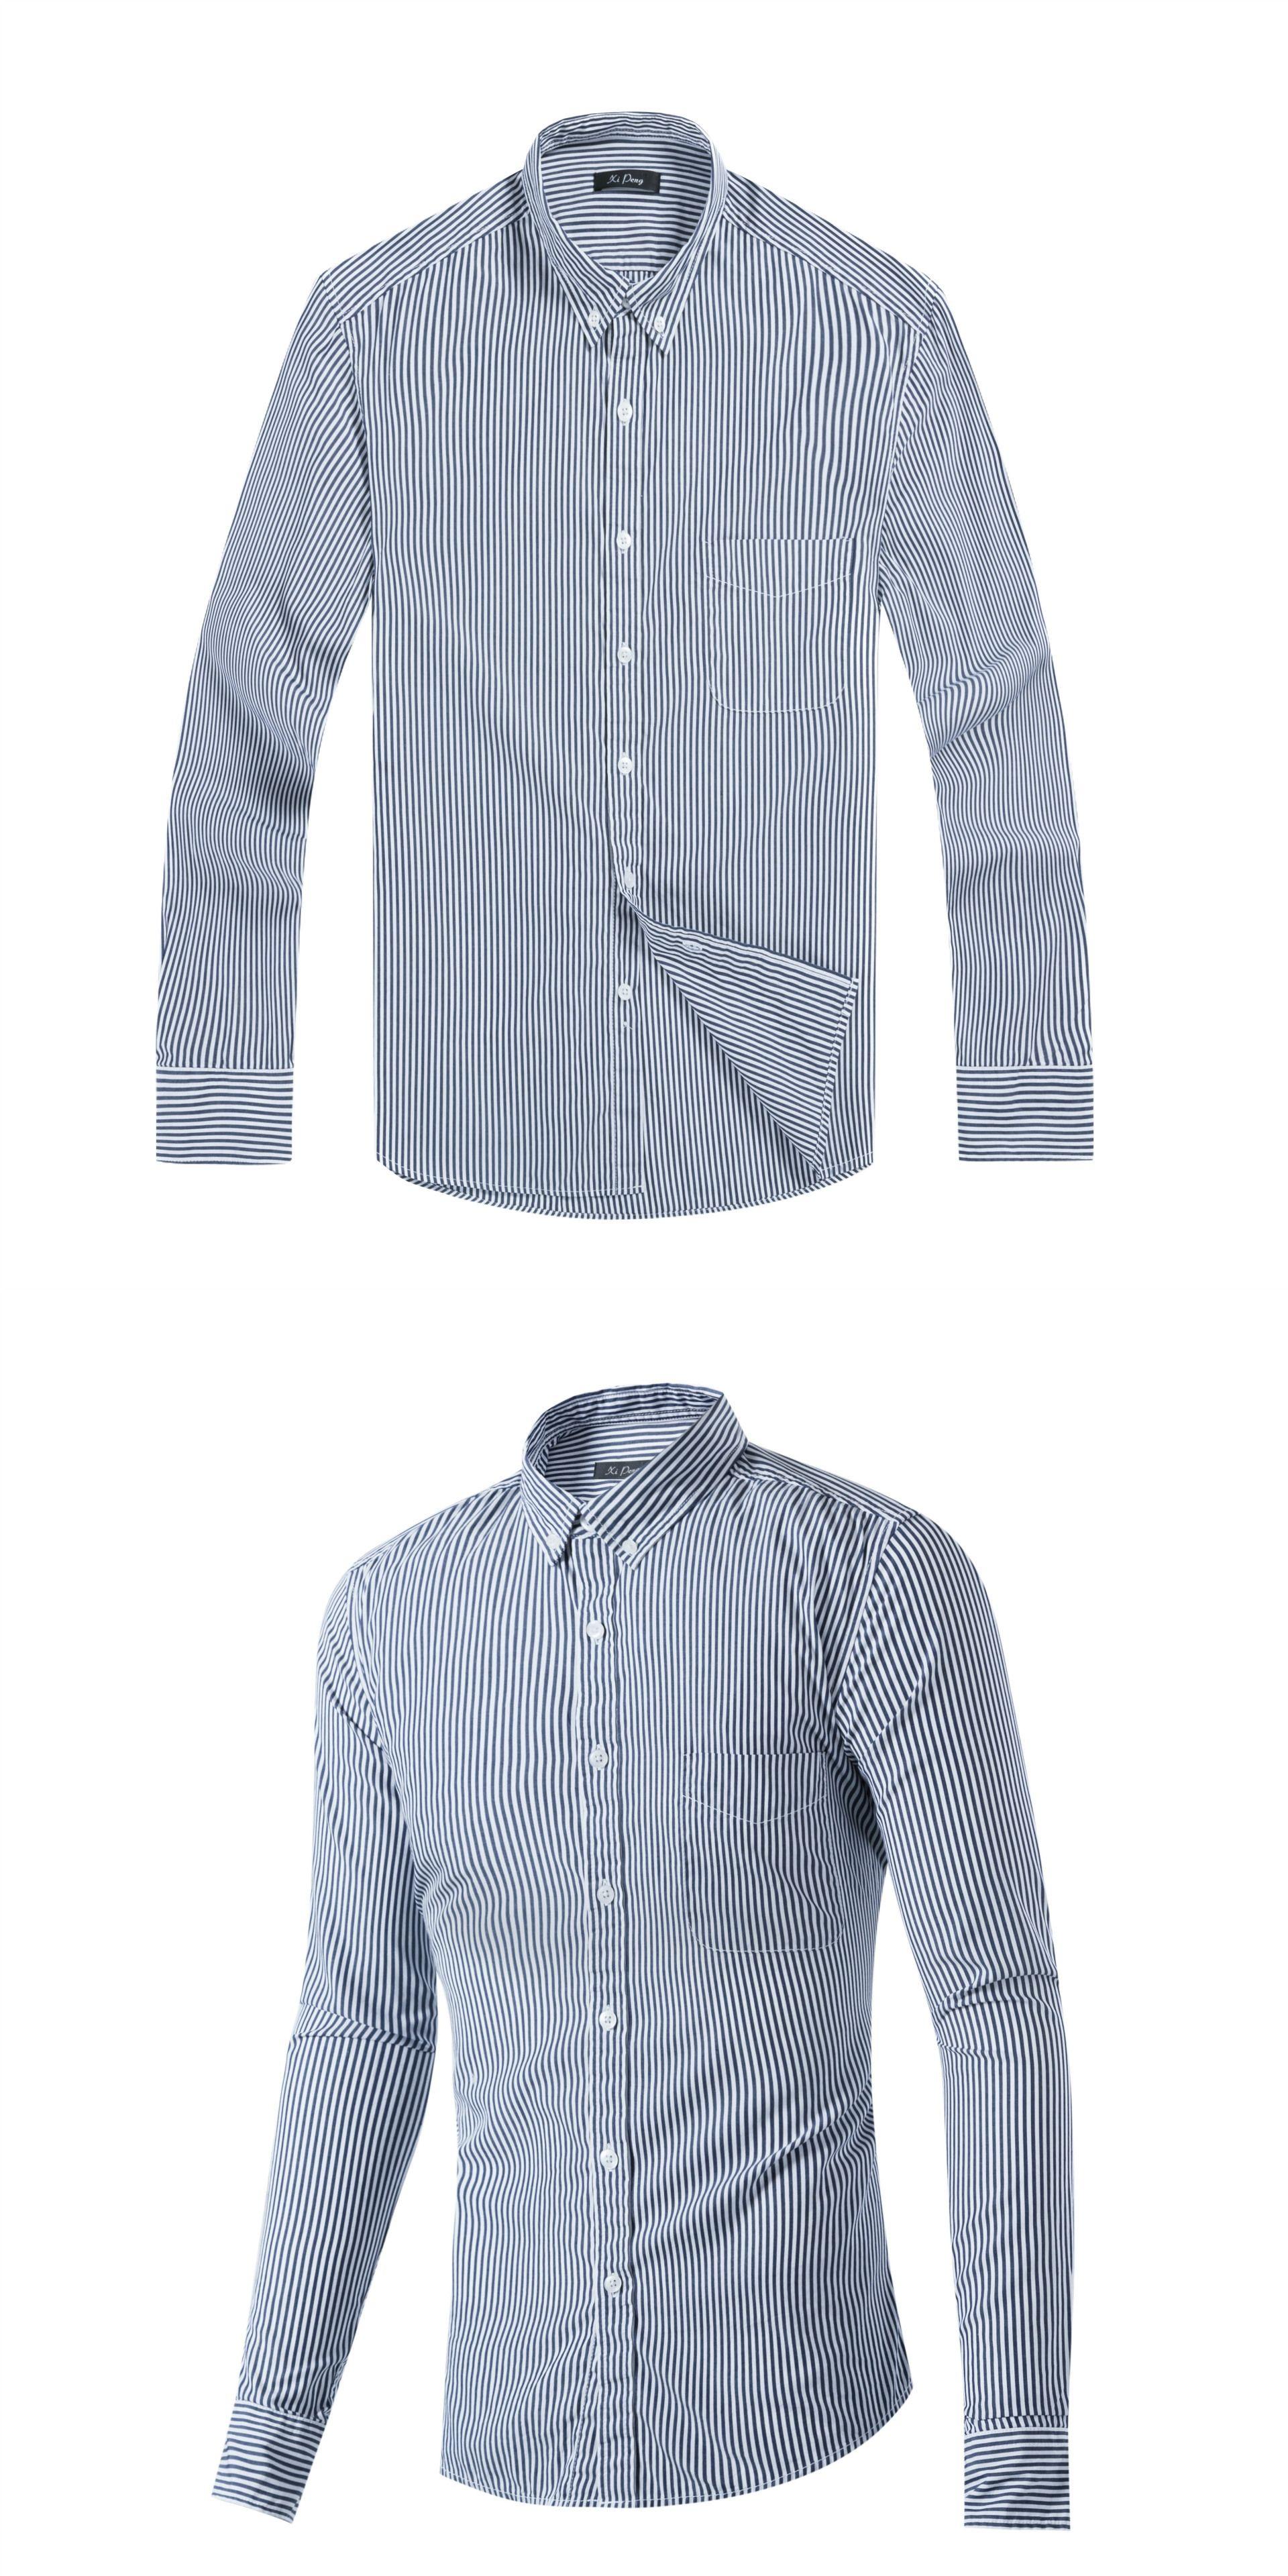 06d1e242db9f 2017 New Men Striped Shirt Long Sleeve Casual Cotton Male Shirt Slim Fit  Business Dress Shirts